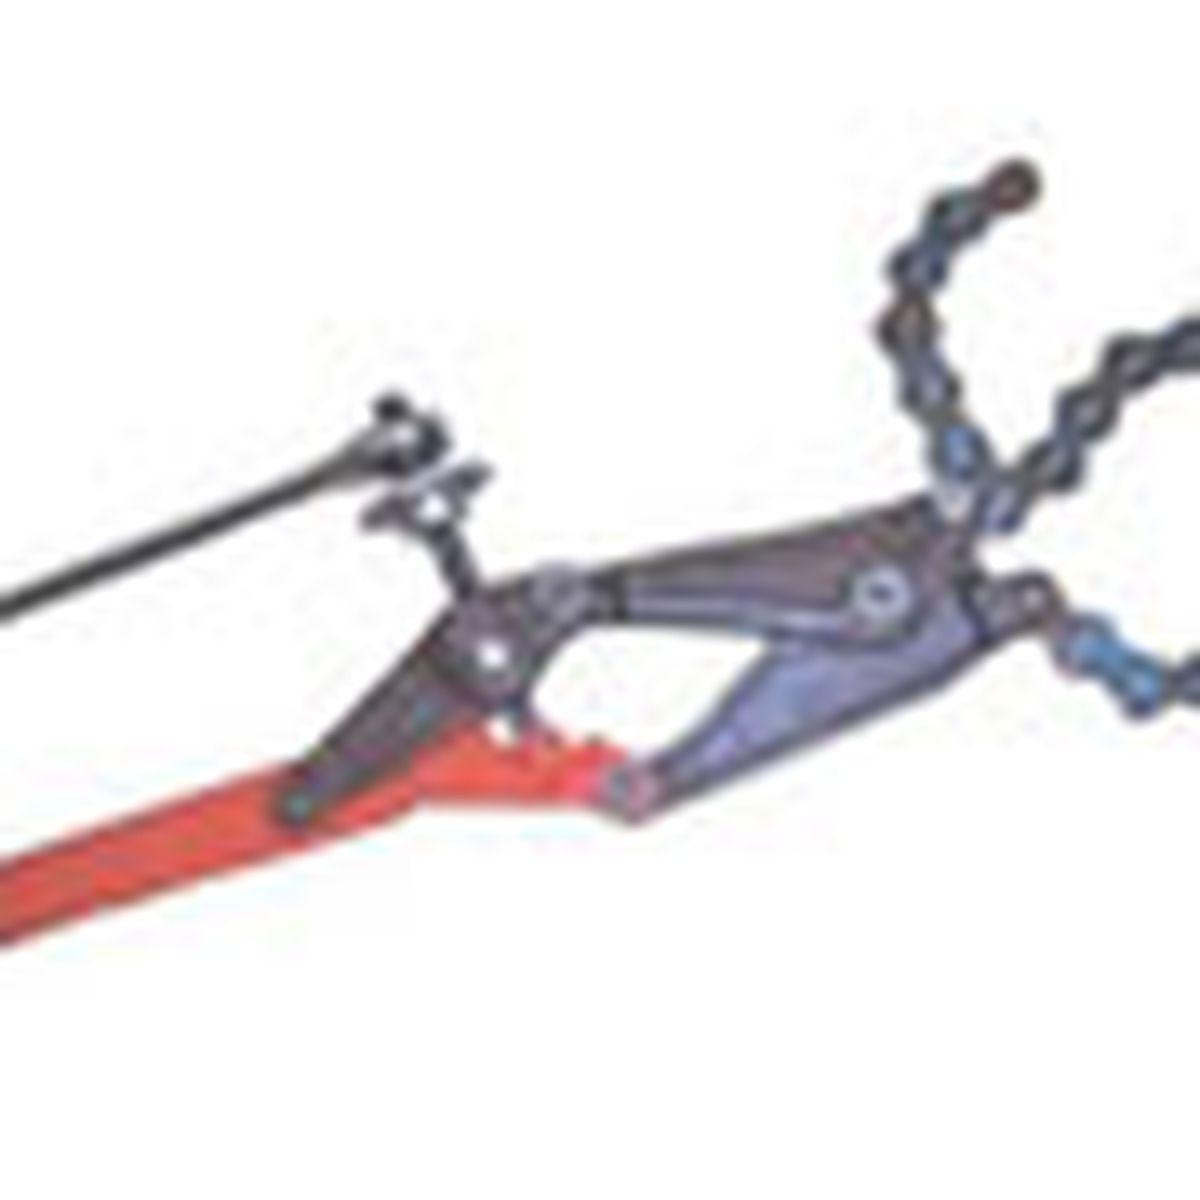 cast-iron pipe cutter